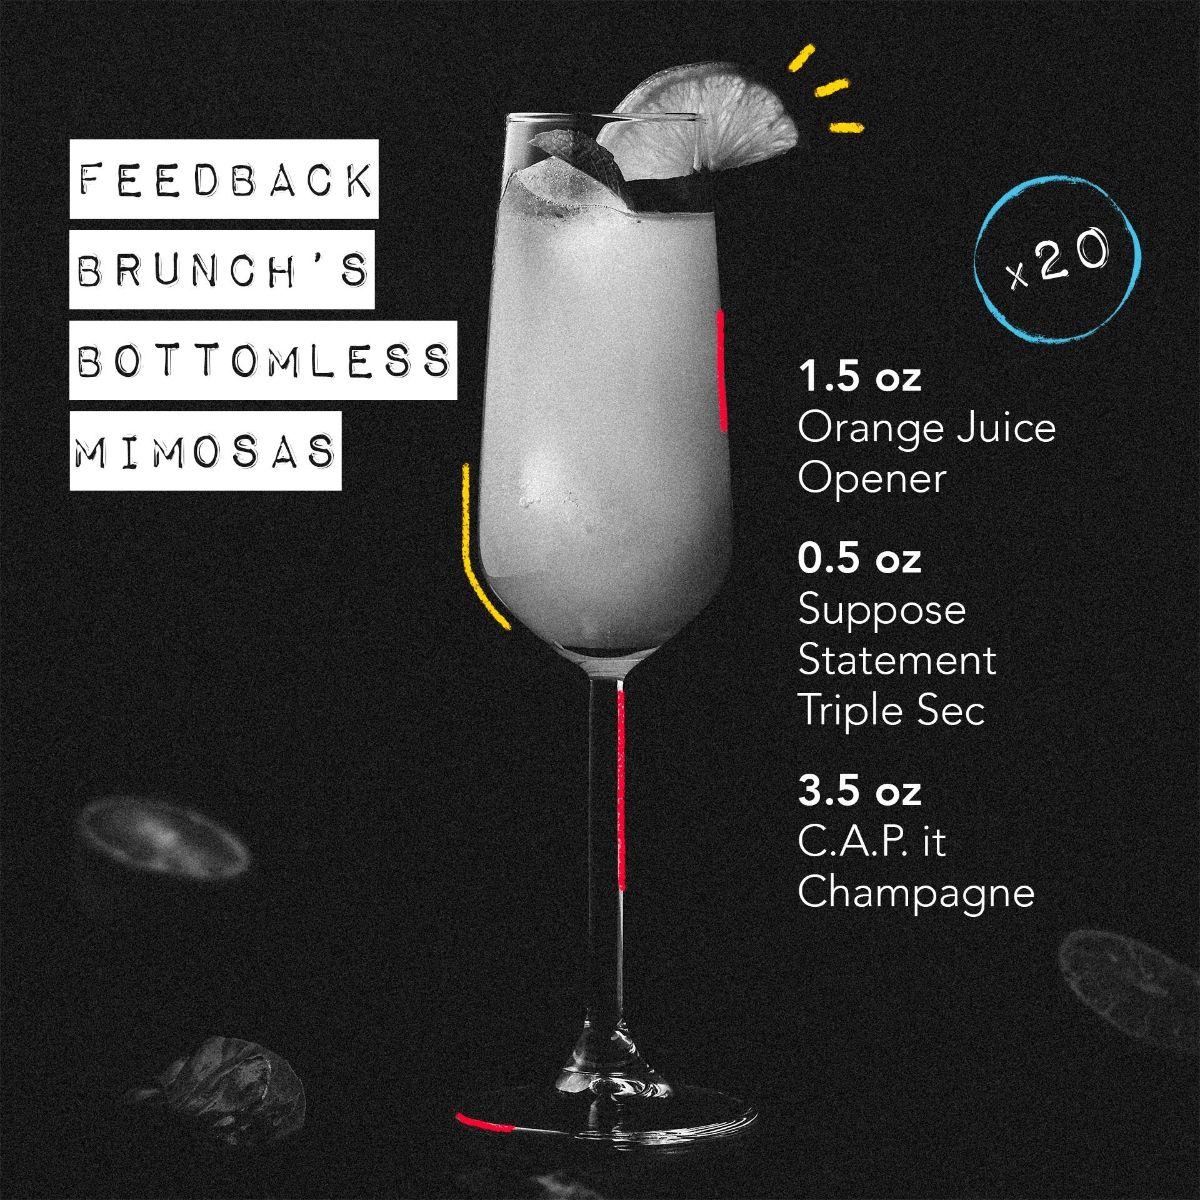 Feedback Brunch's Bottomless Mimosas